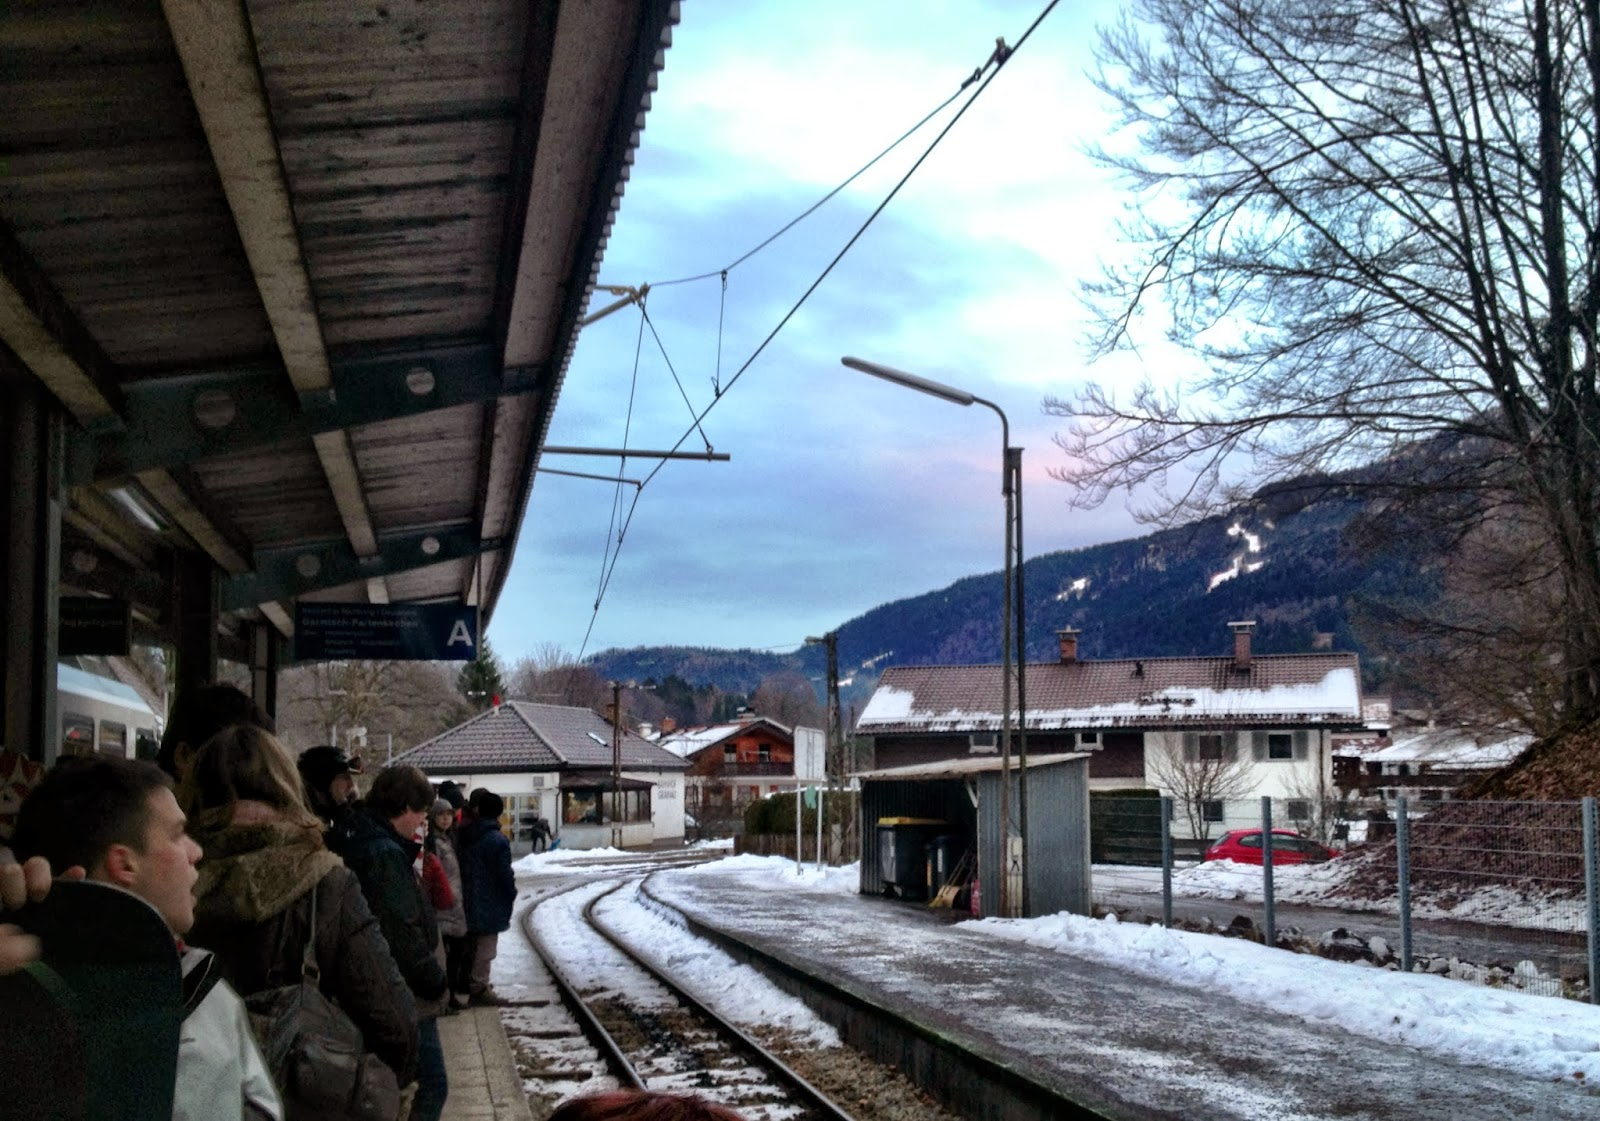 Changing trains at a snowy Grainau